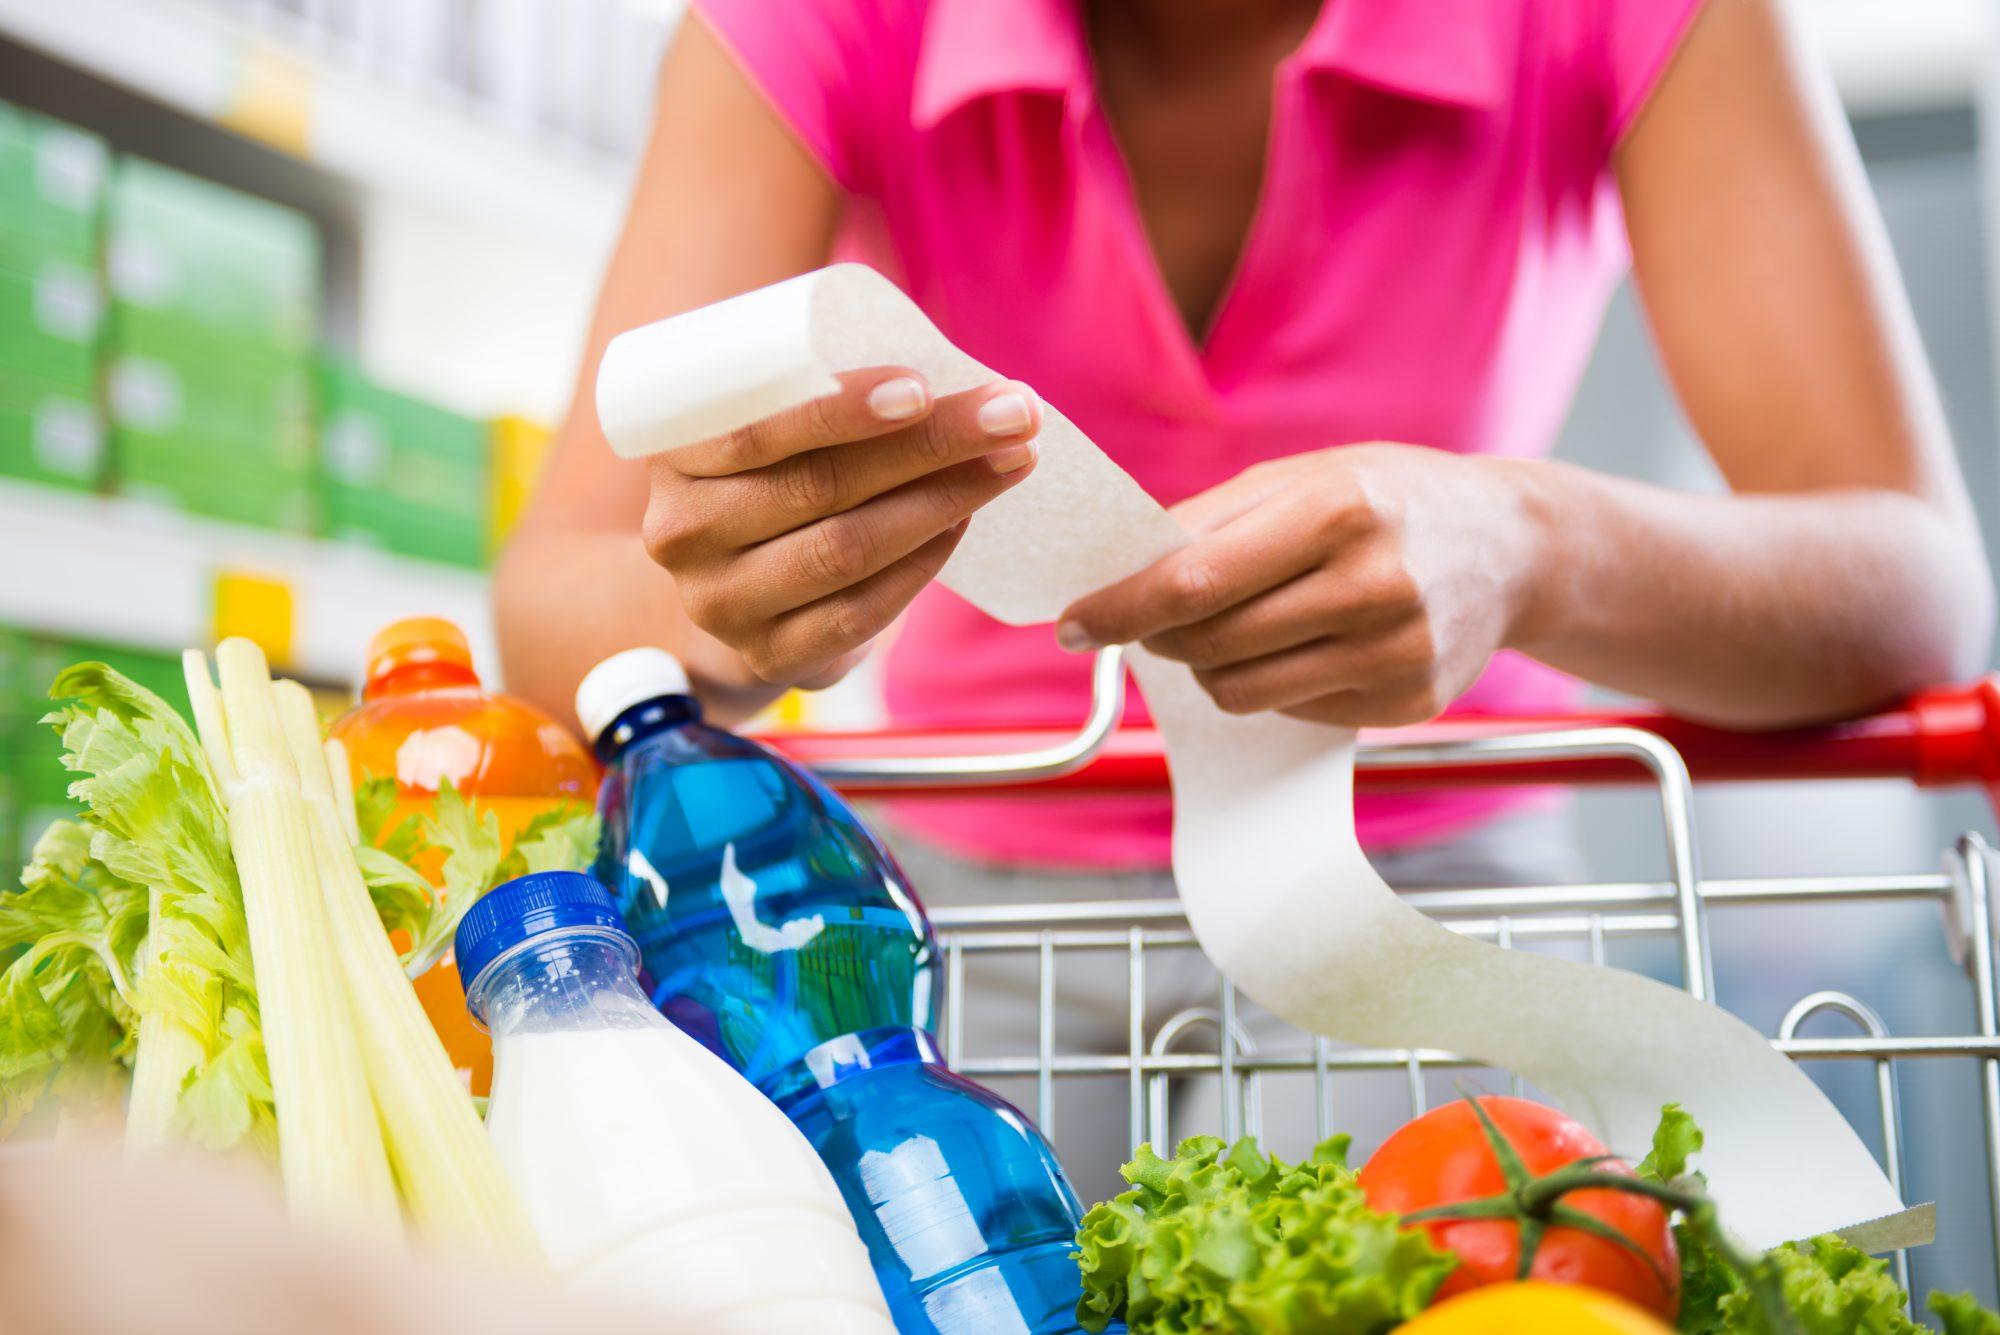 getty-grocery-receipt-image